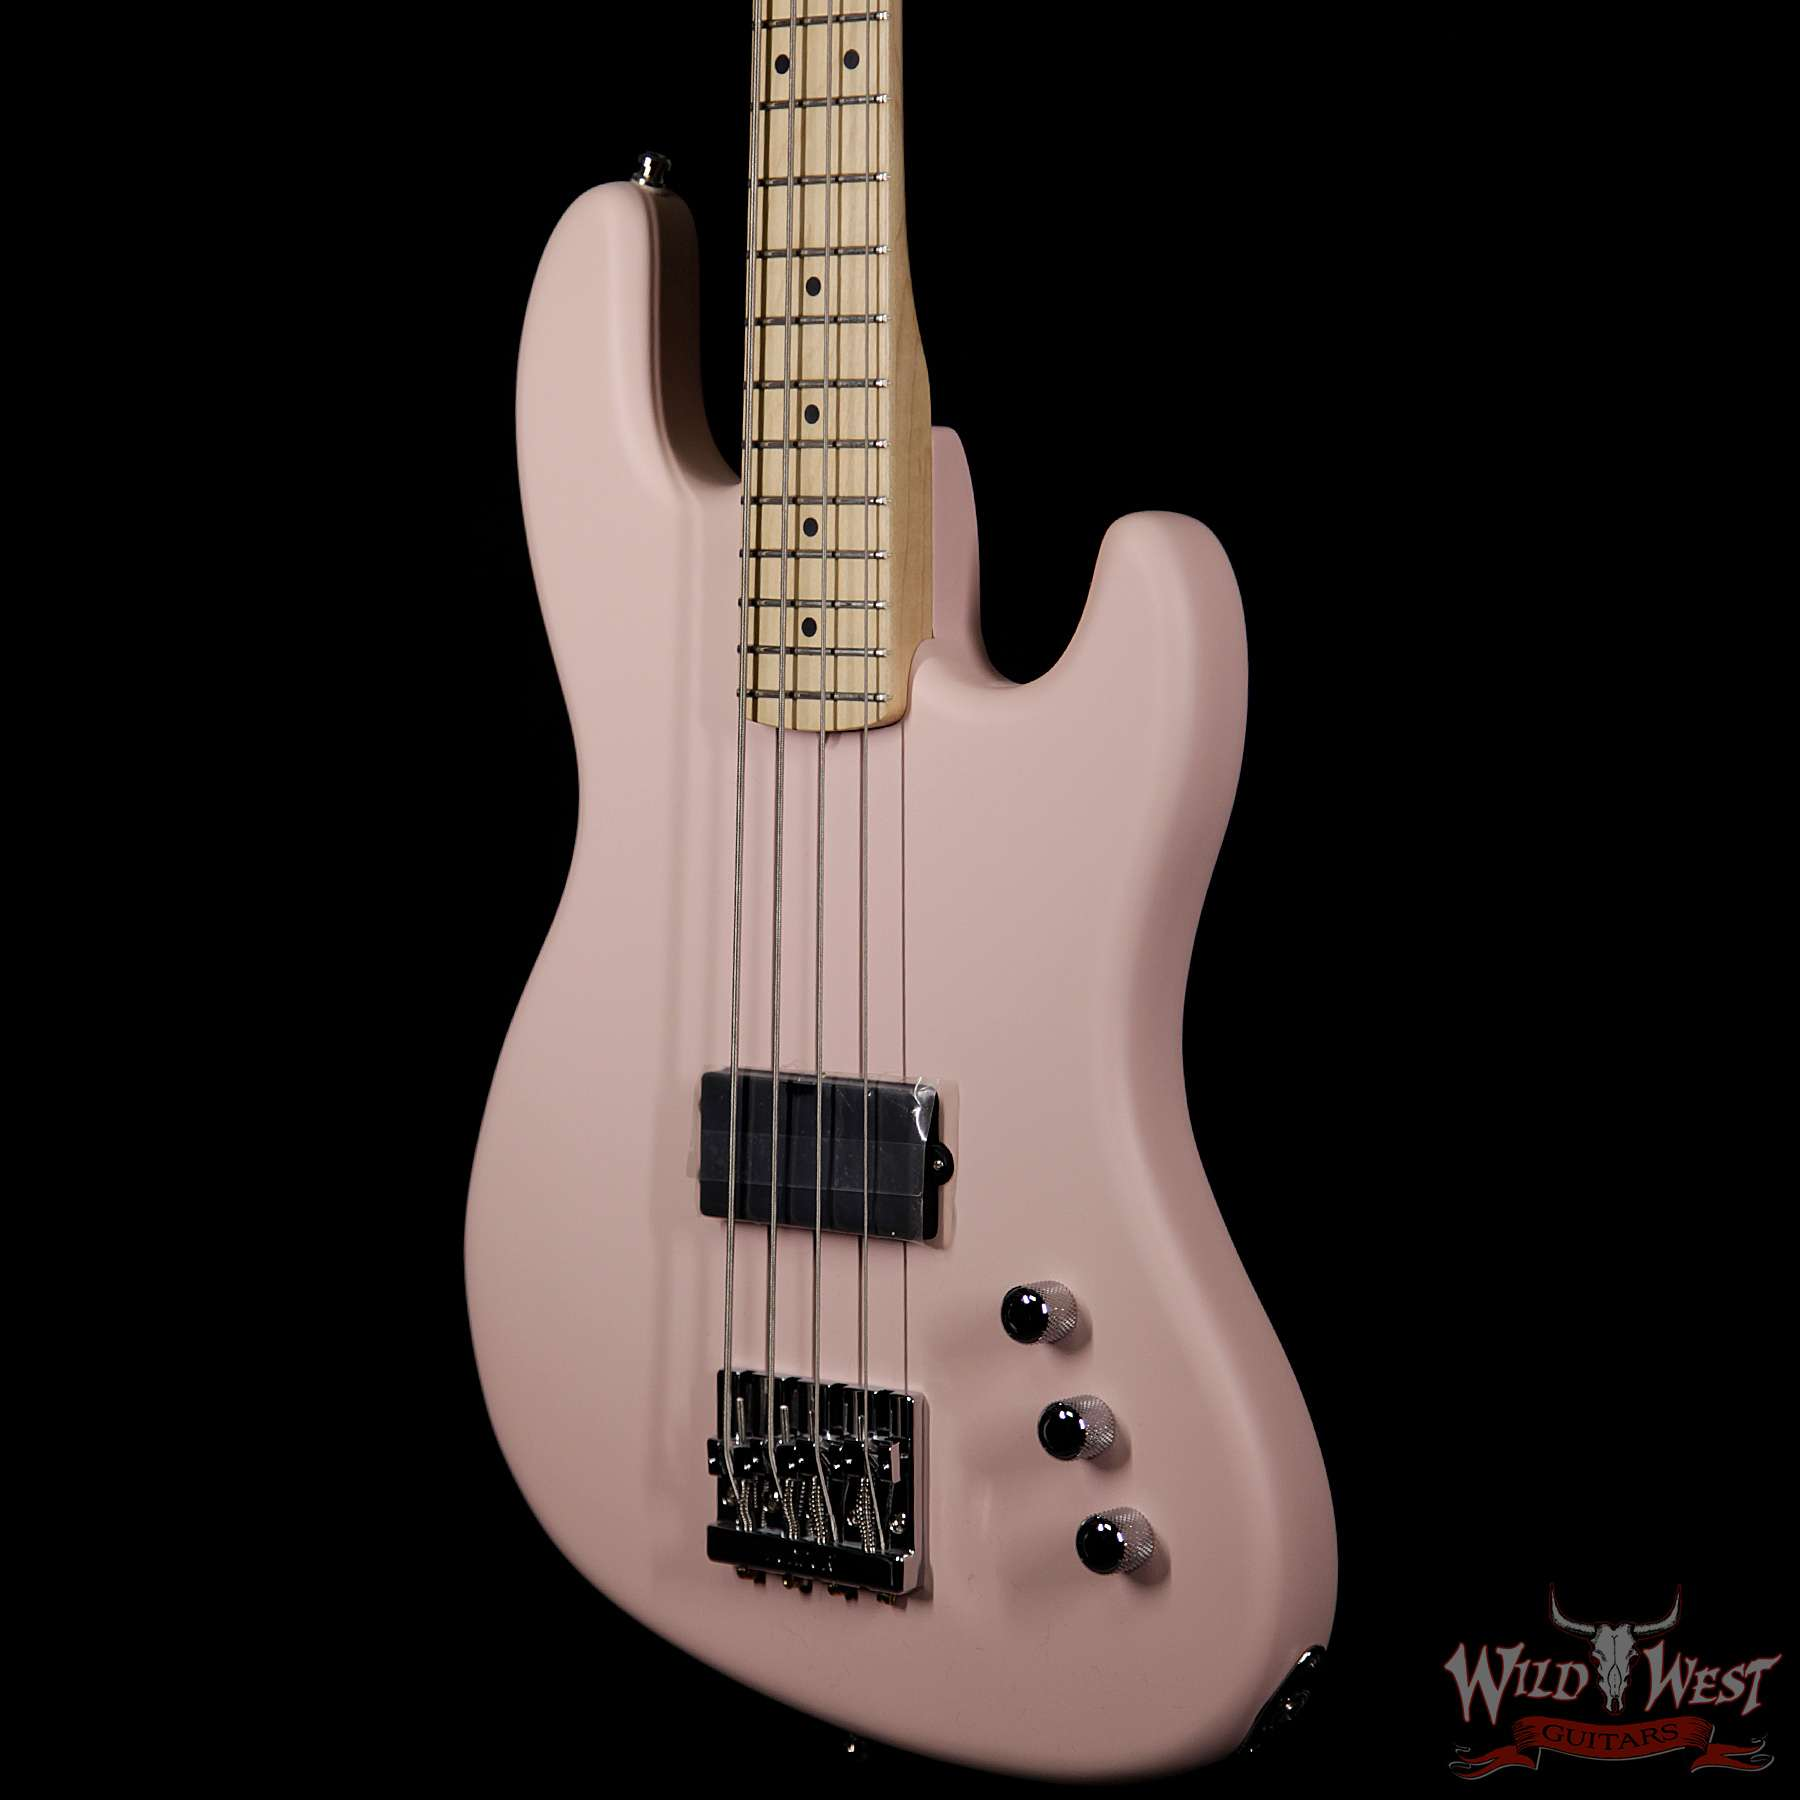 fender usa flea signature active jazz bass shell pink wild west guitars. Black Bedroom Furniture Sets. Home Design Ideas